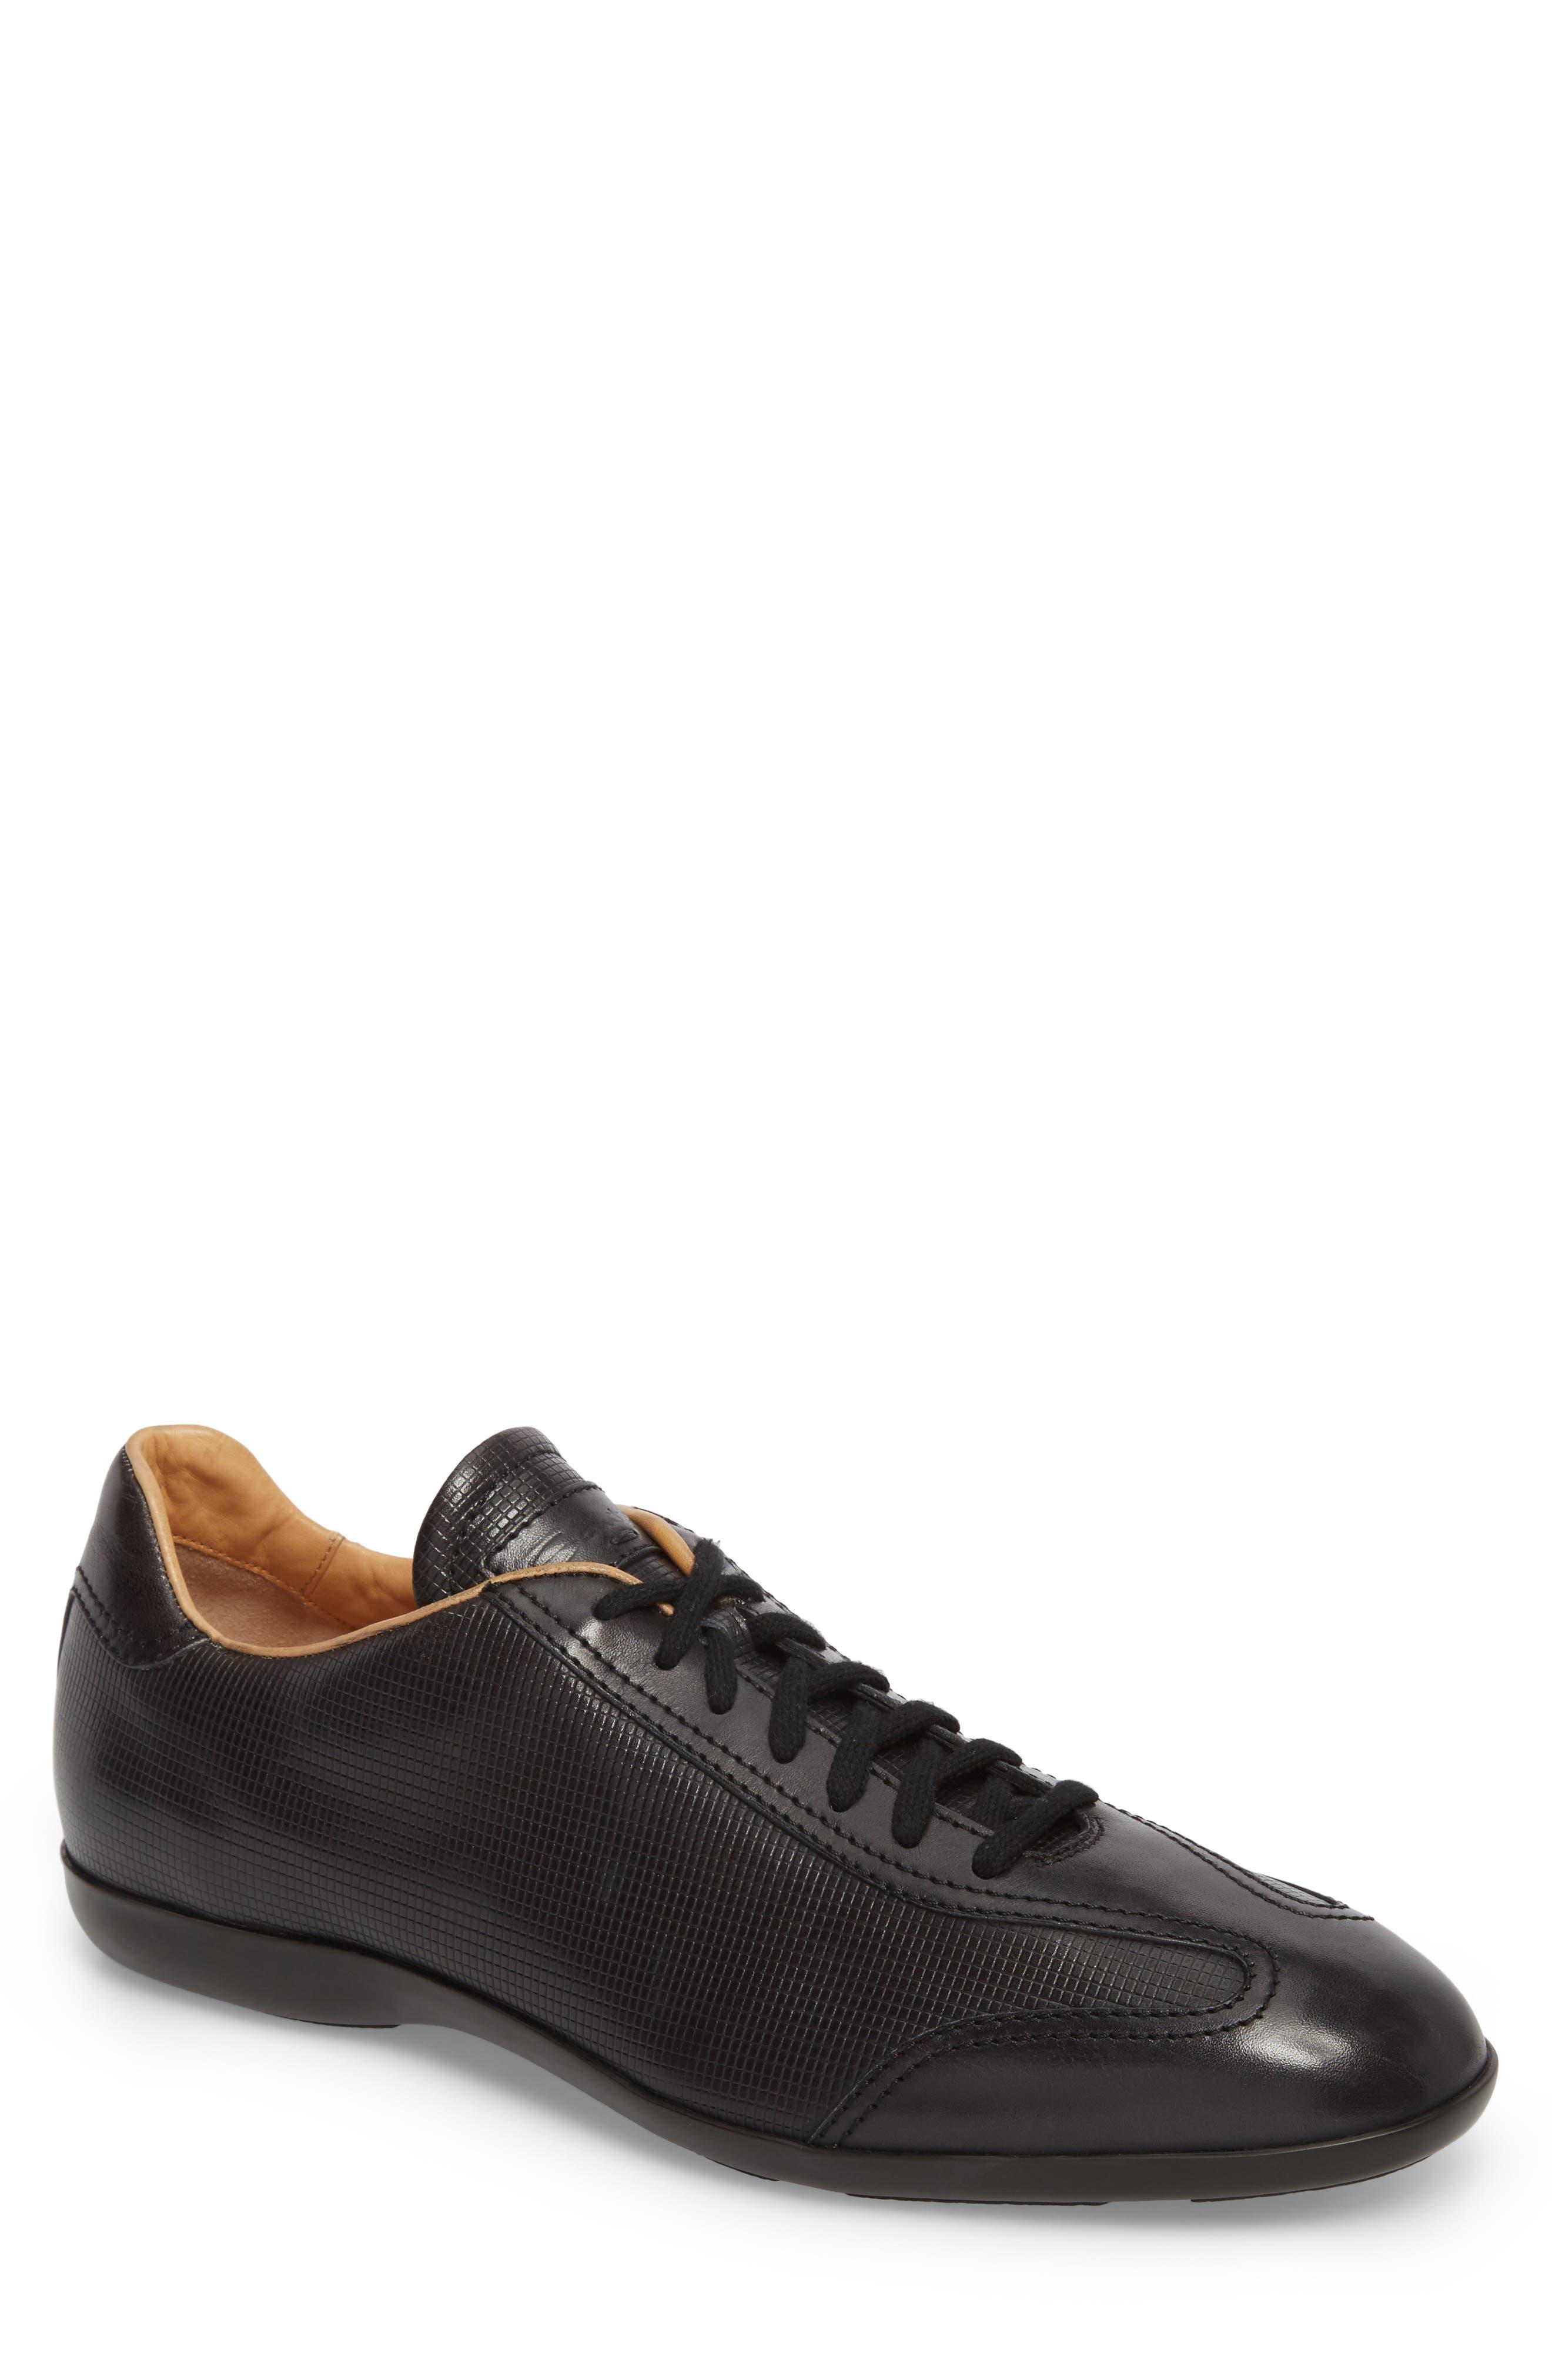 'Cortez' Sneaker,                         Main,                         color, Brown Leather